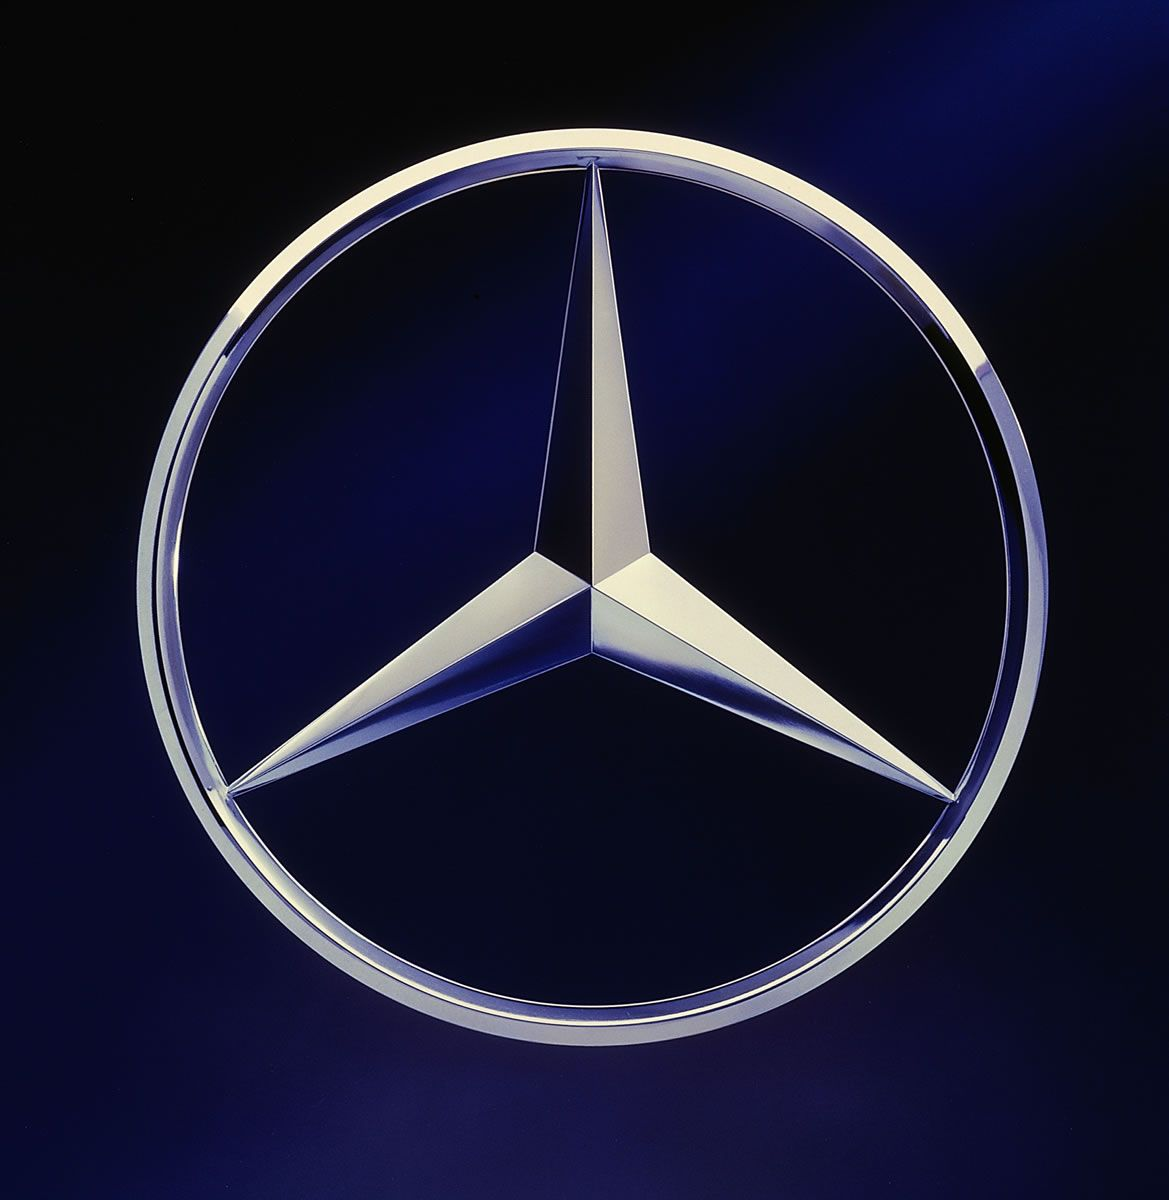 Mercedes Benz Of Sugar Land: The Three-pointed Star Originally Symbolized Daimler's